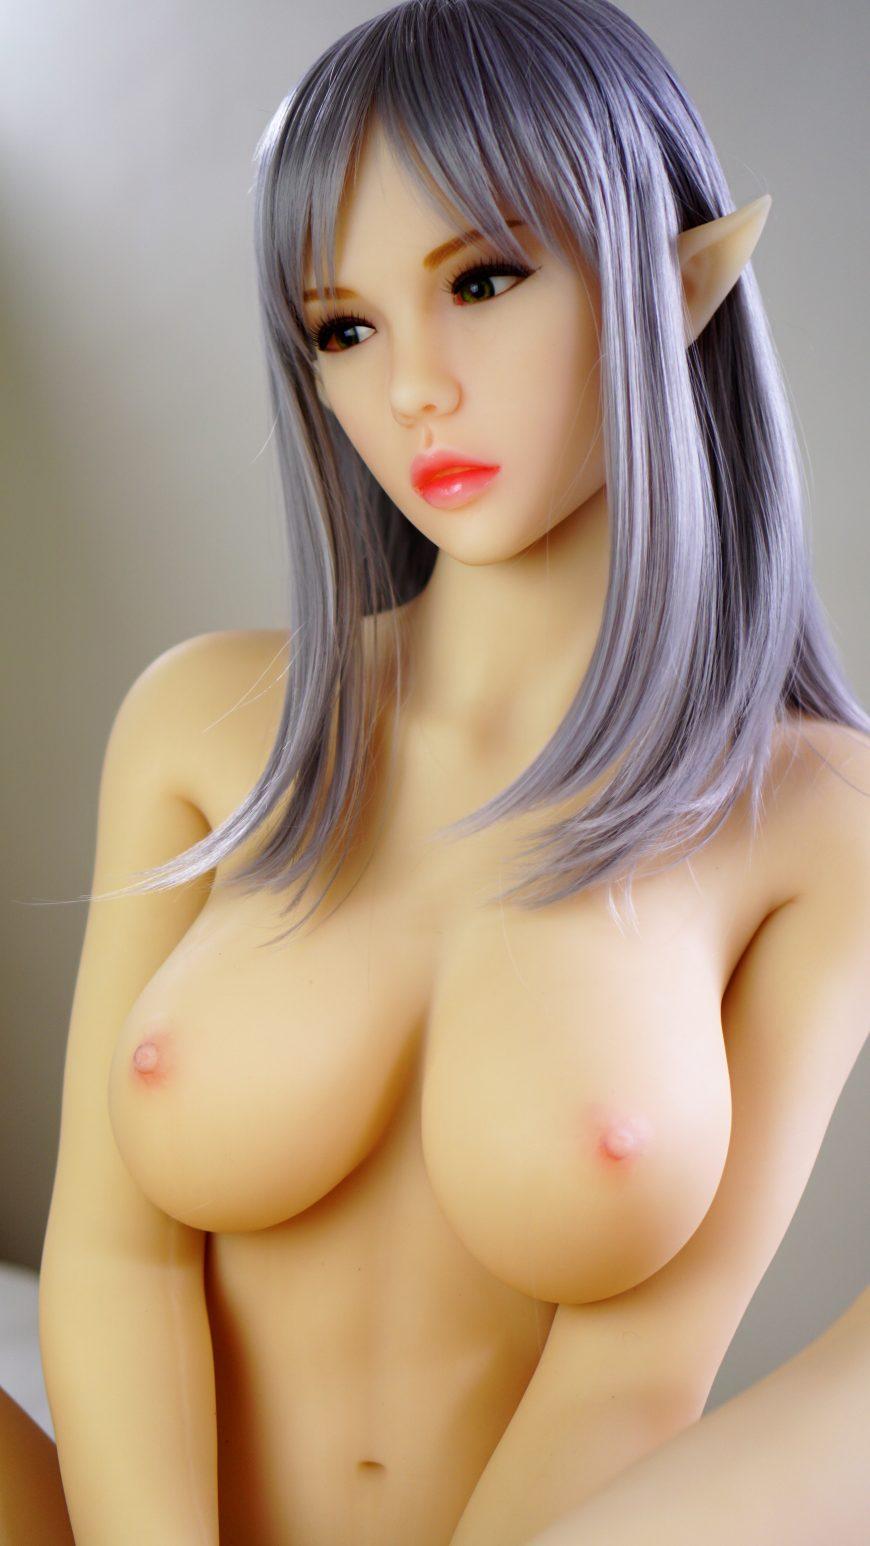 Sex-Doll-Elf-Dora-from-Dirty-Knights-Sex-Dolls-1 (3)